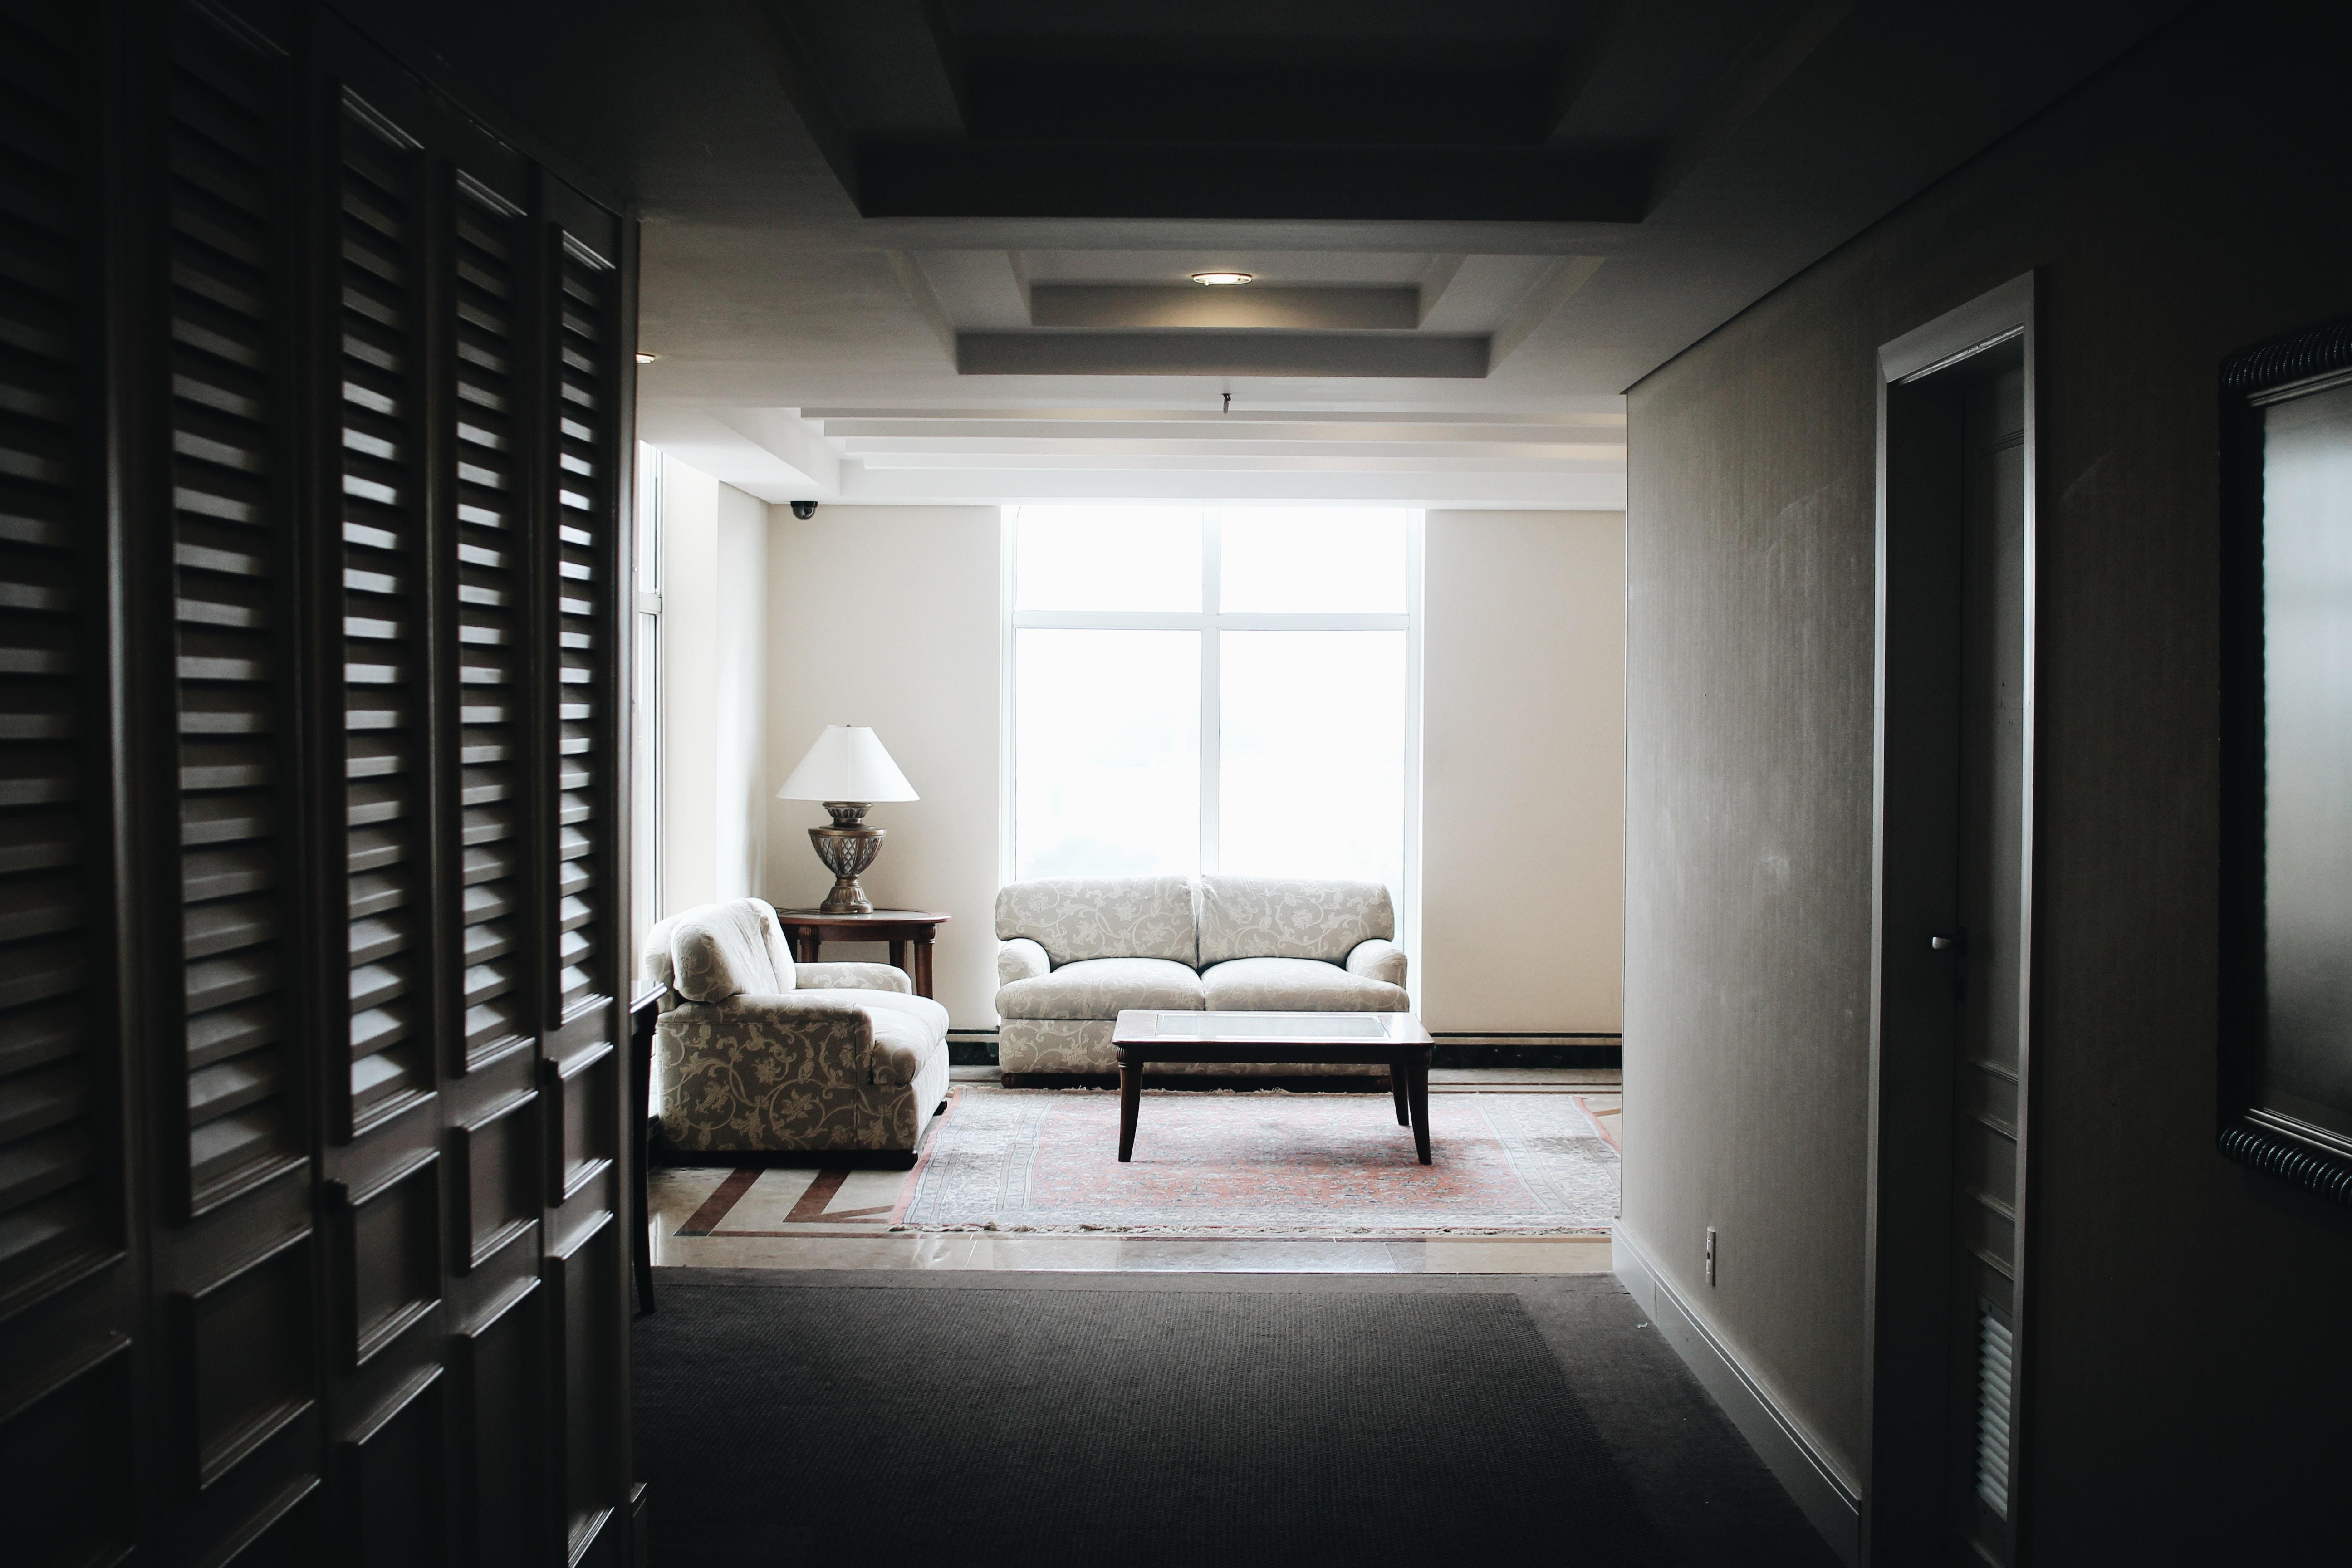 Hq Room Pictures Download Free Images On Unsplash